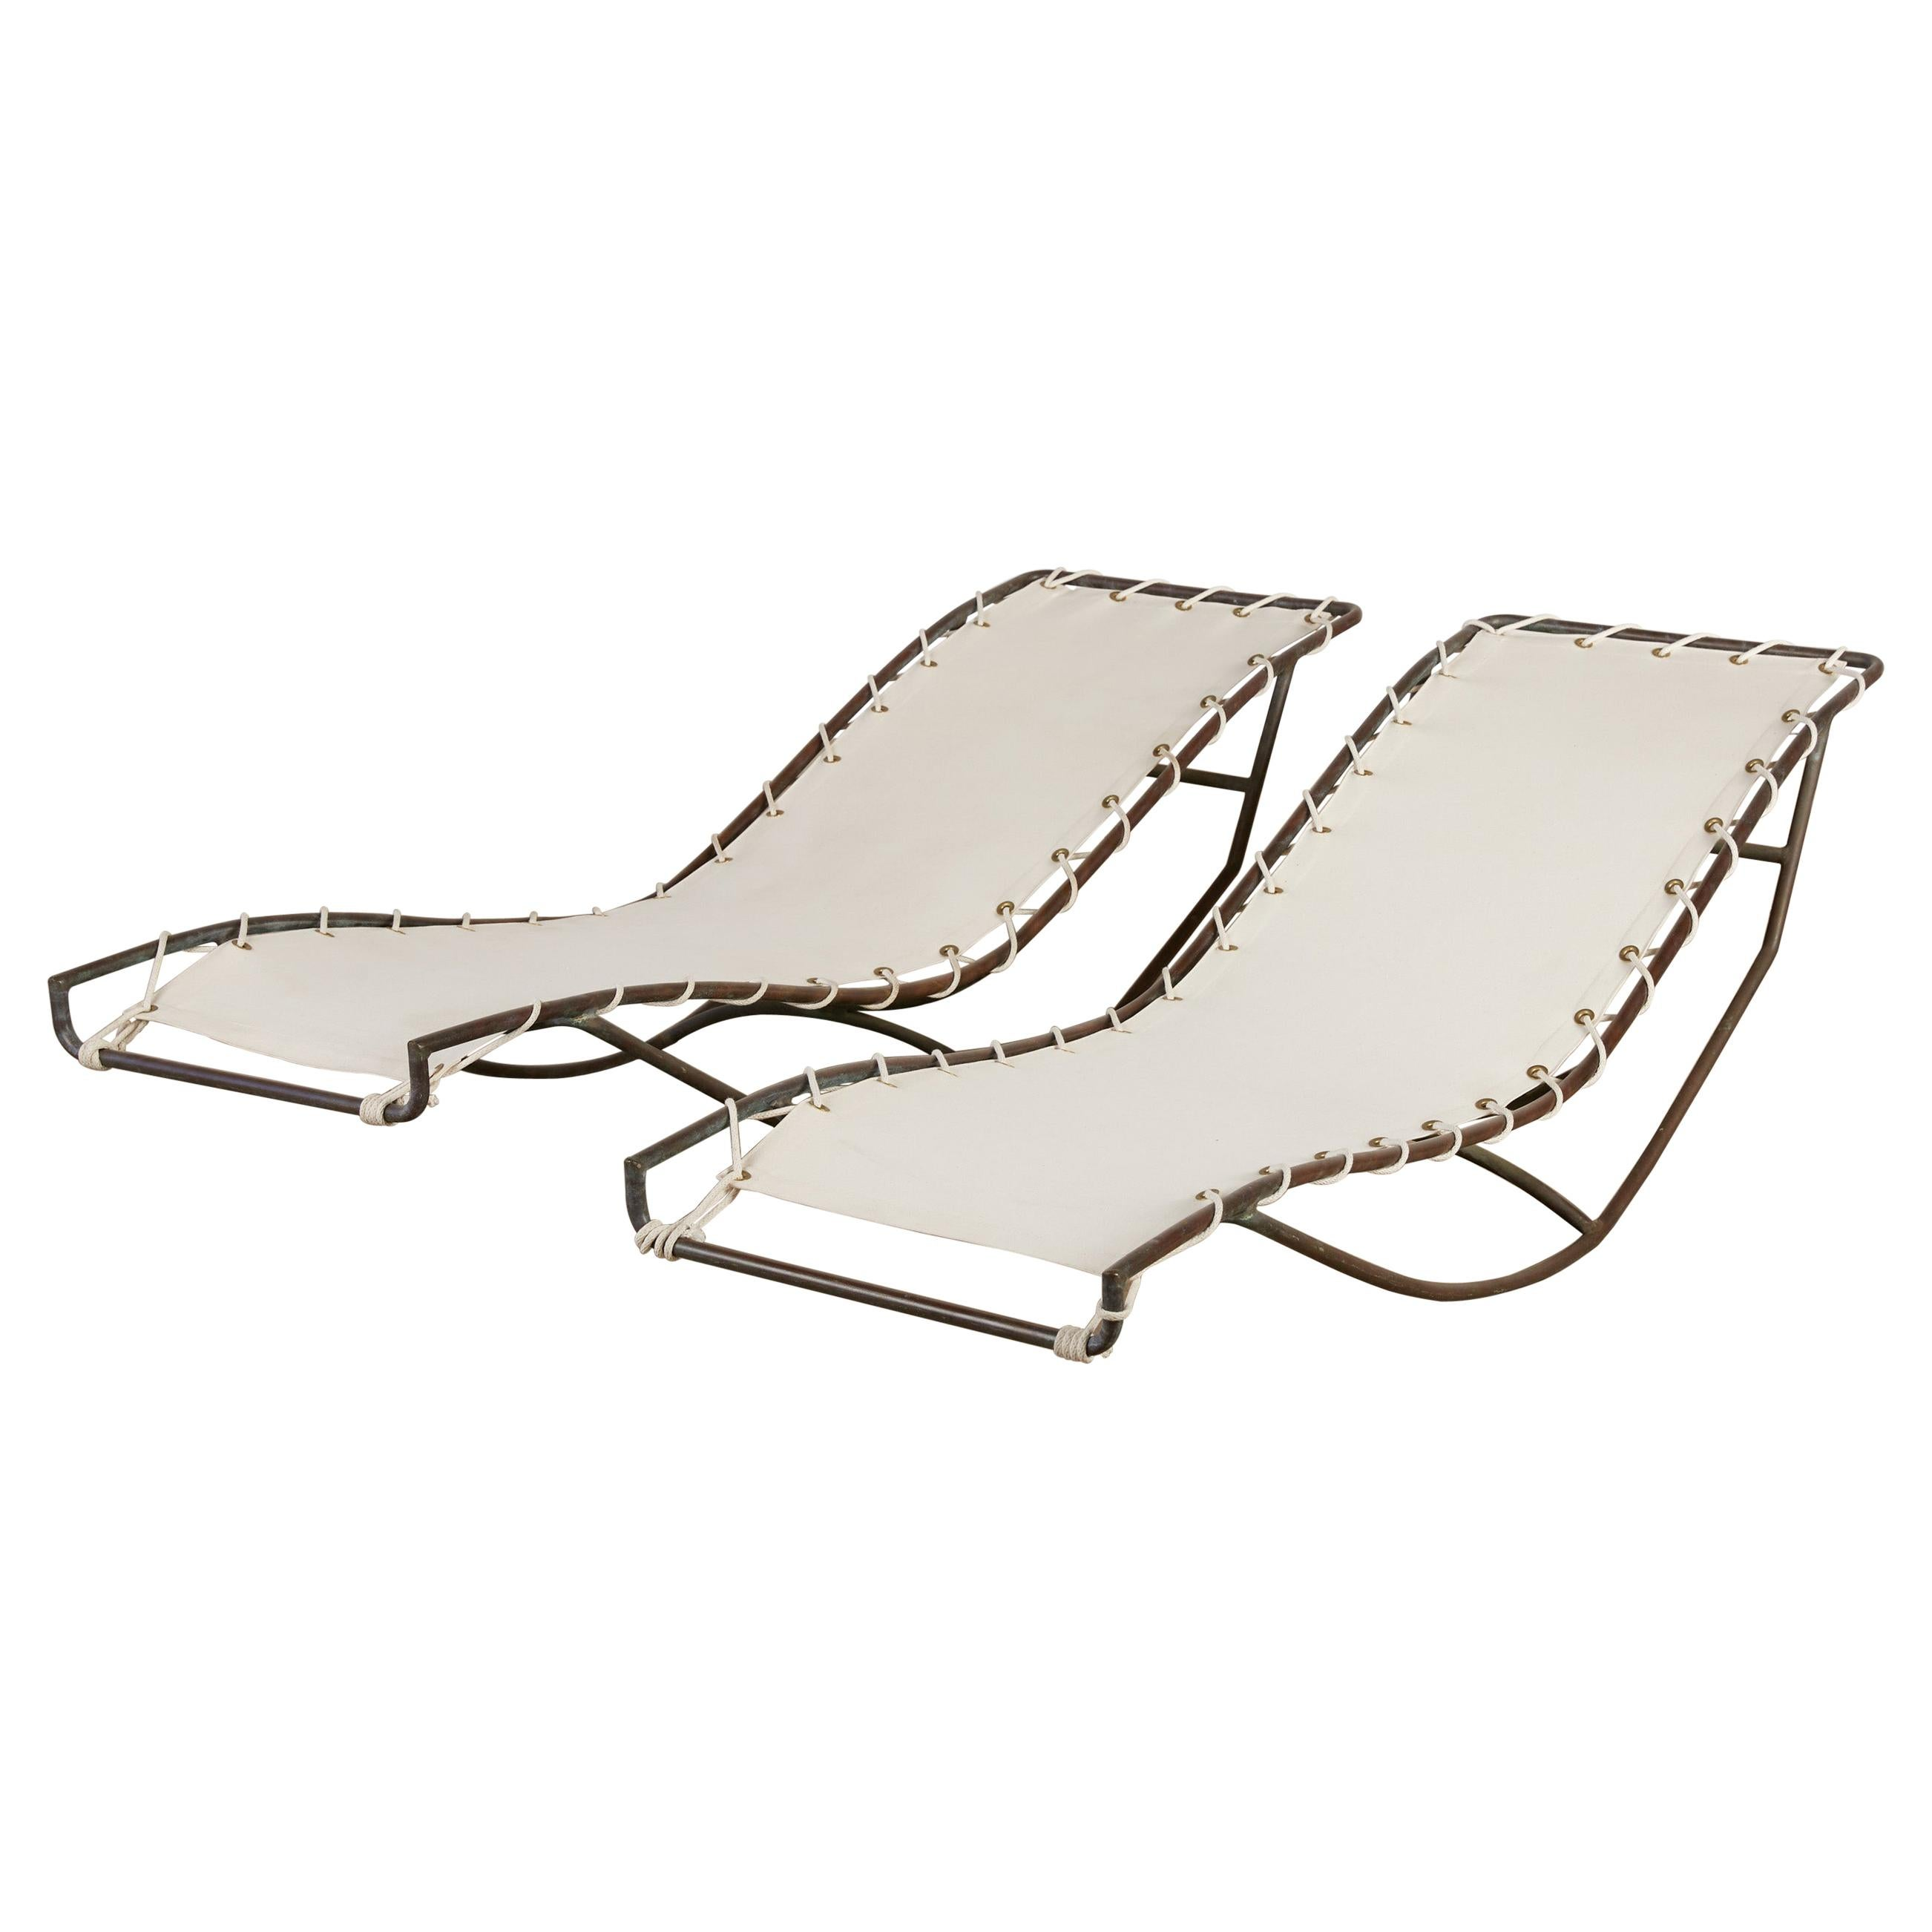 Waikiki Rocking Chaise Lounges by Walter Lamb